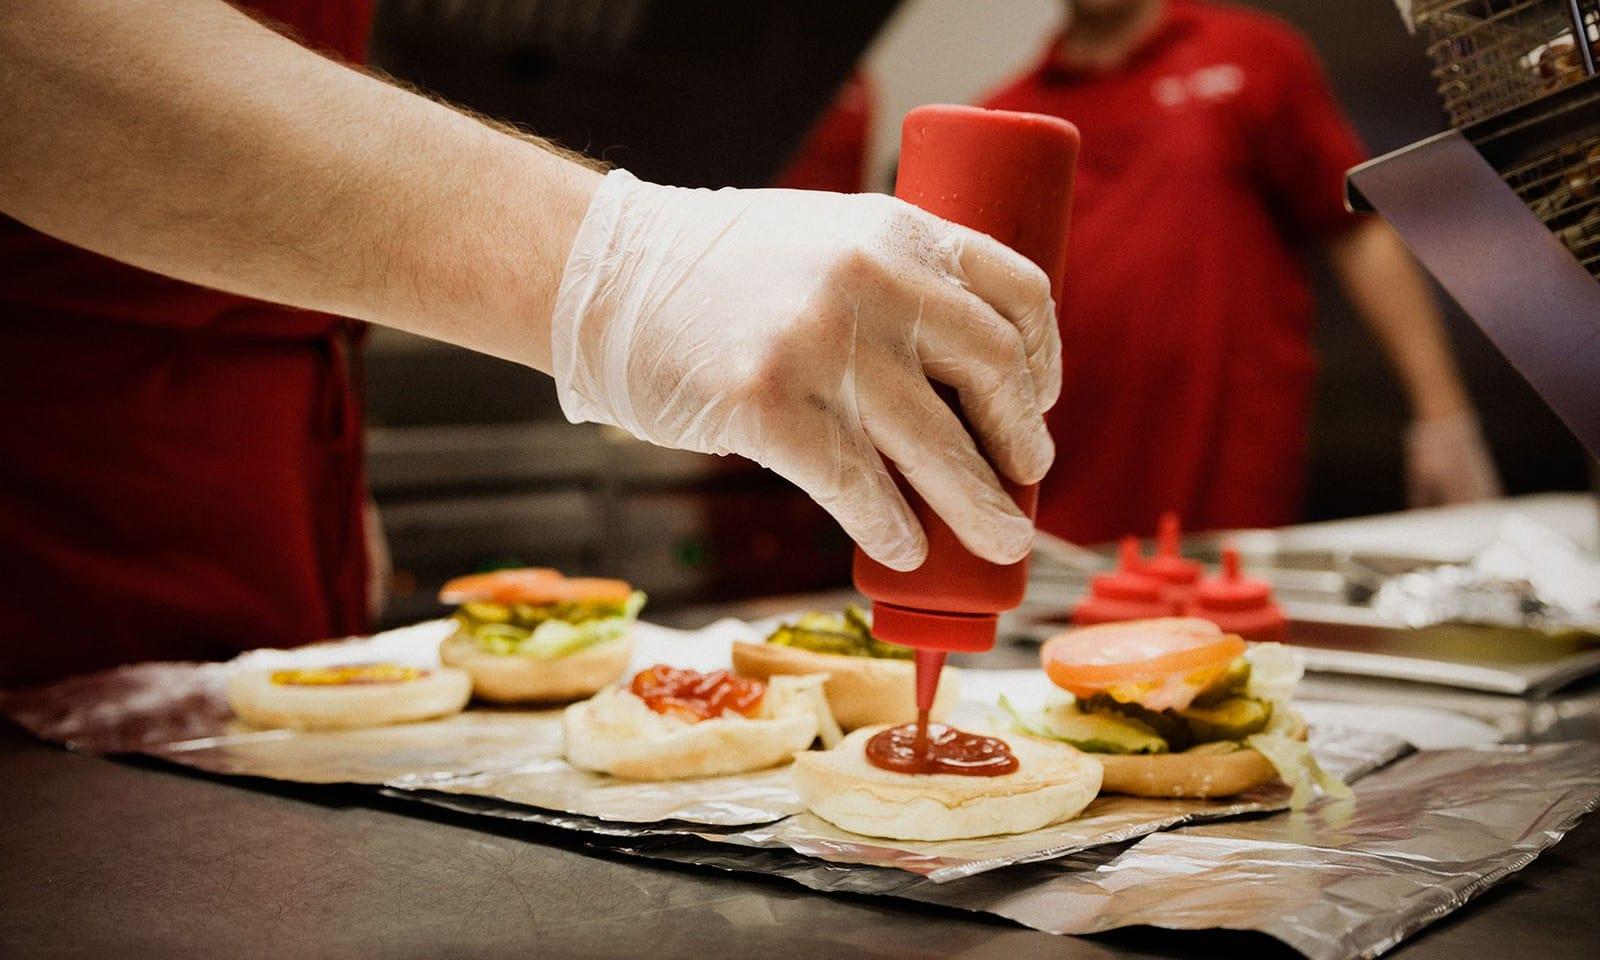 5-Guys-Burger-and-Fries-New-York-04-1600×960